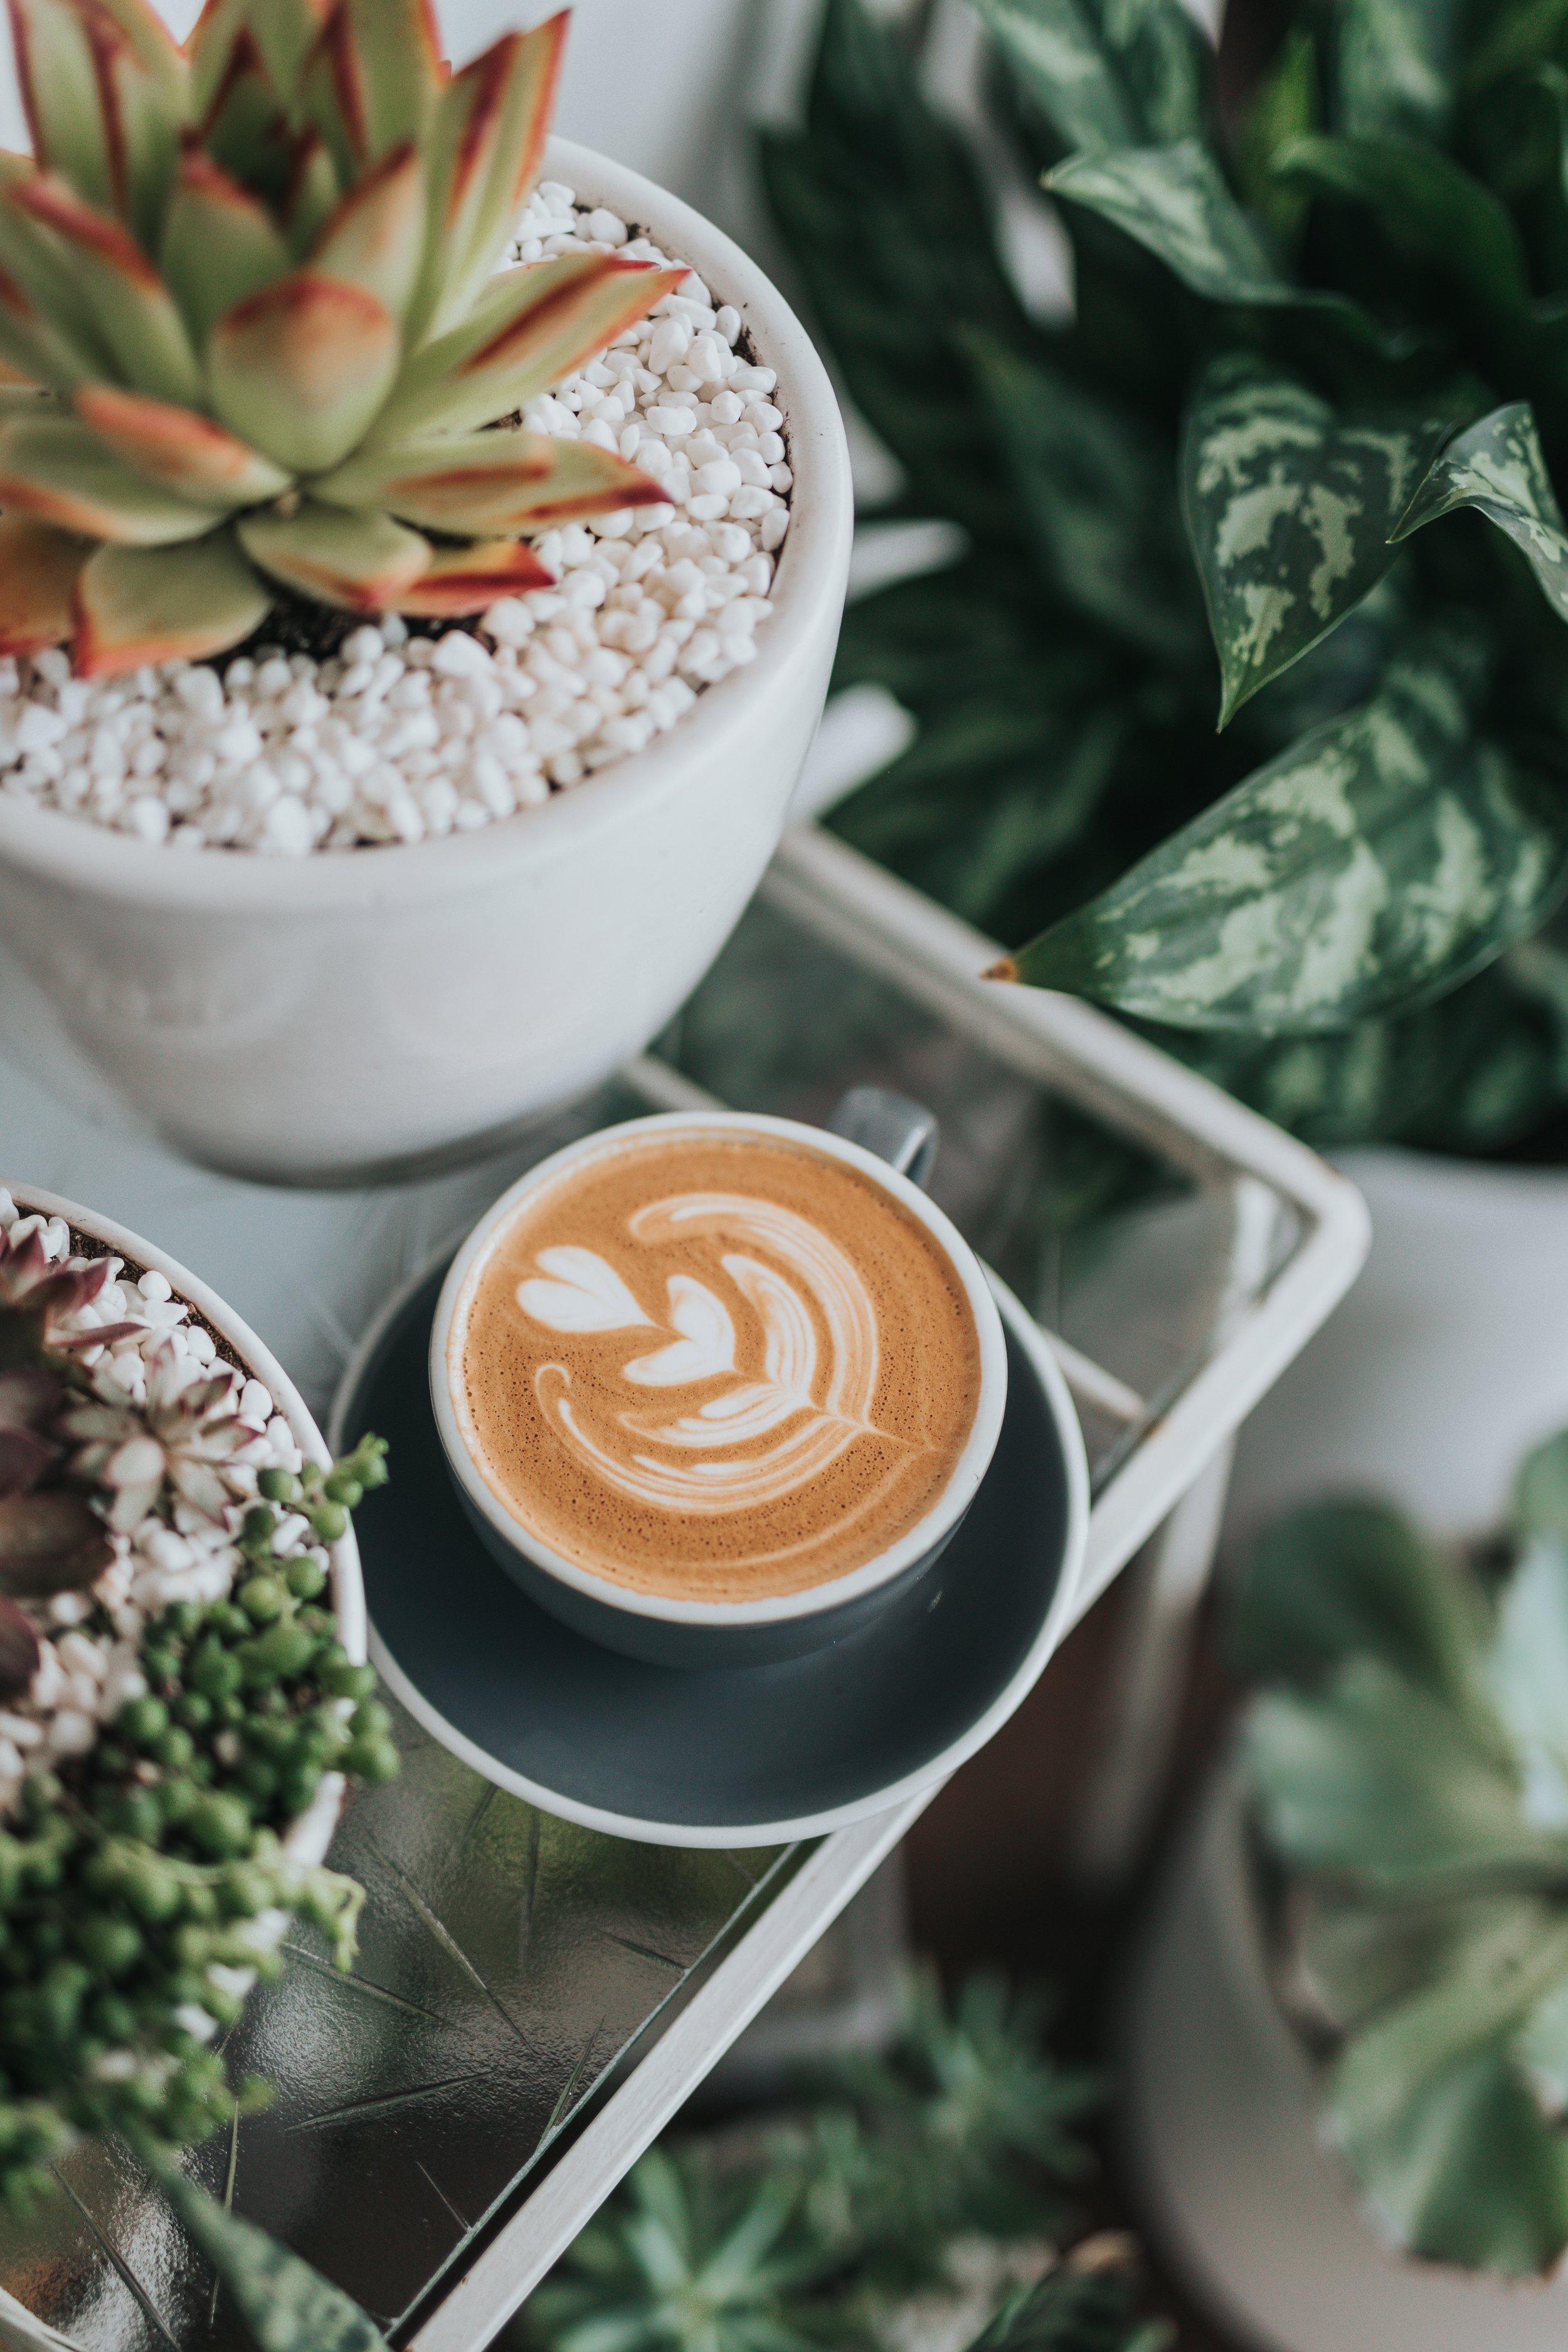 Pumpkin Spice Latte - Serves 1